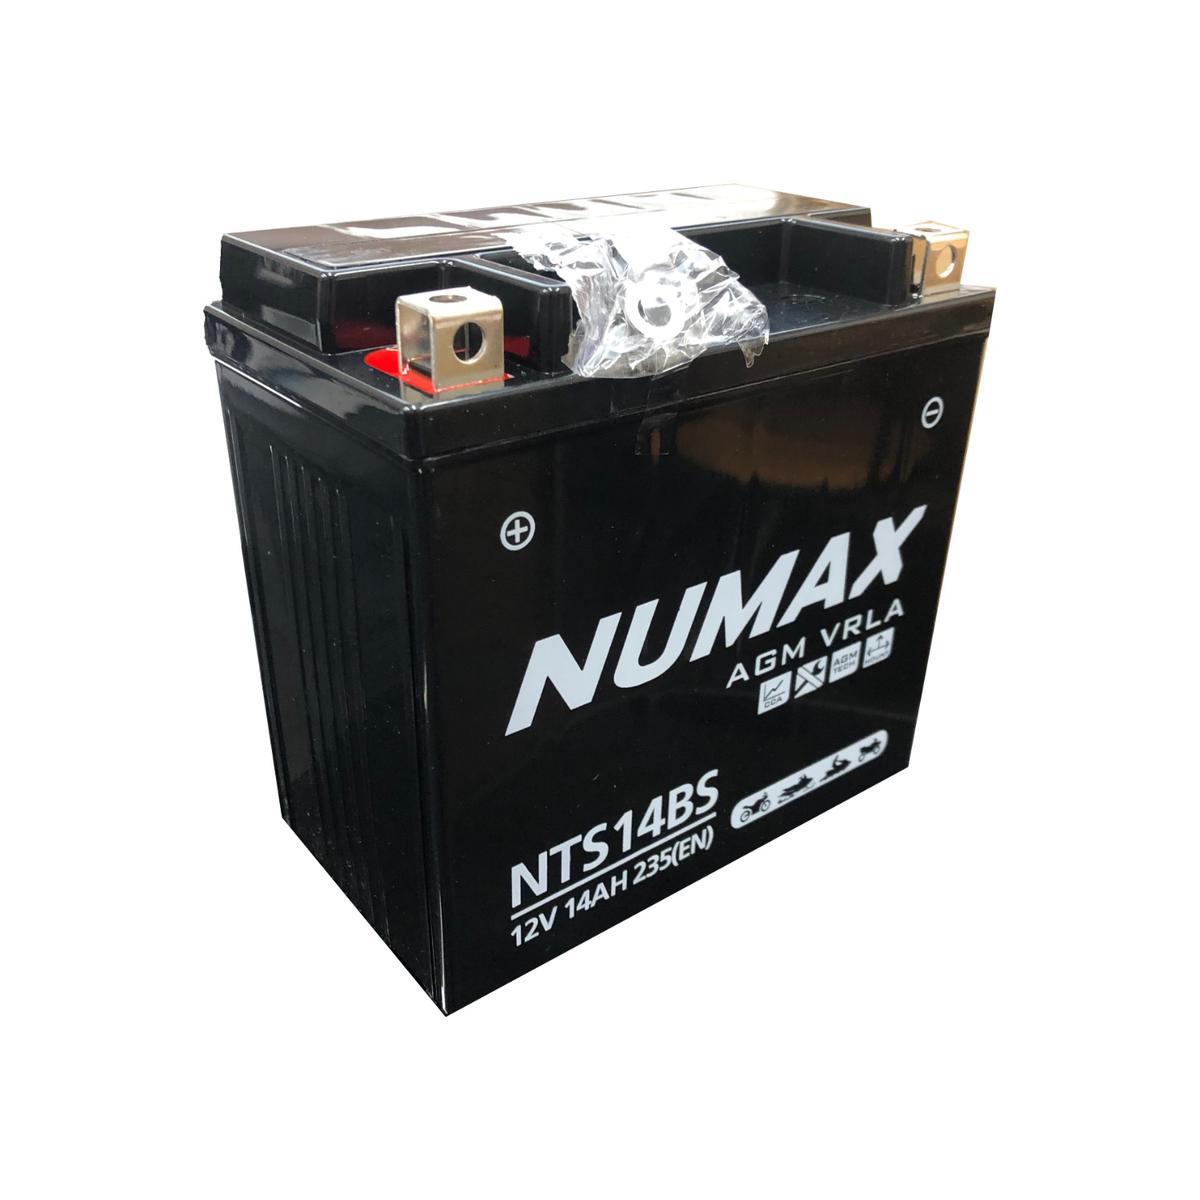 Numax NTS14BS 12v Motorbike Bike Battery KAWASAKI 800cc VN800 Vulcan YTX14-4